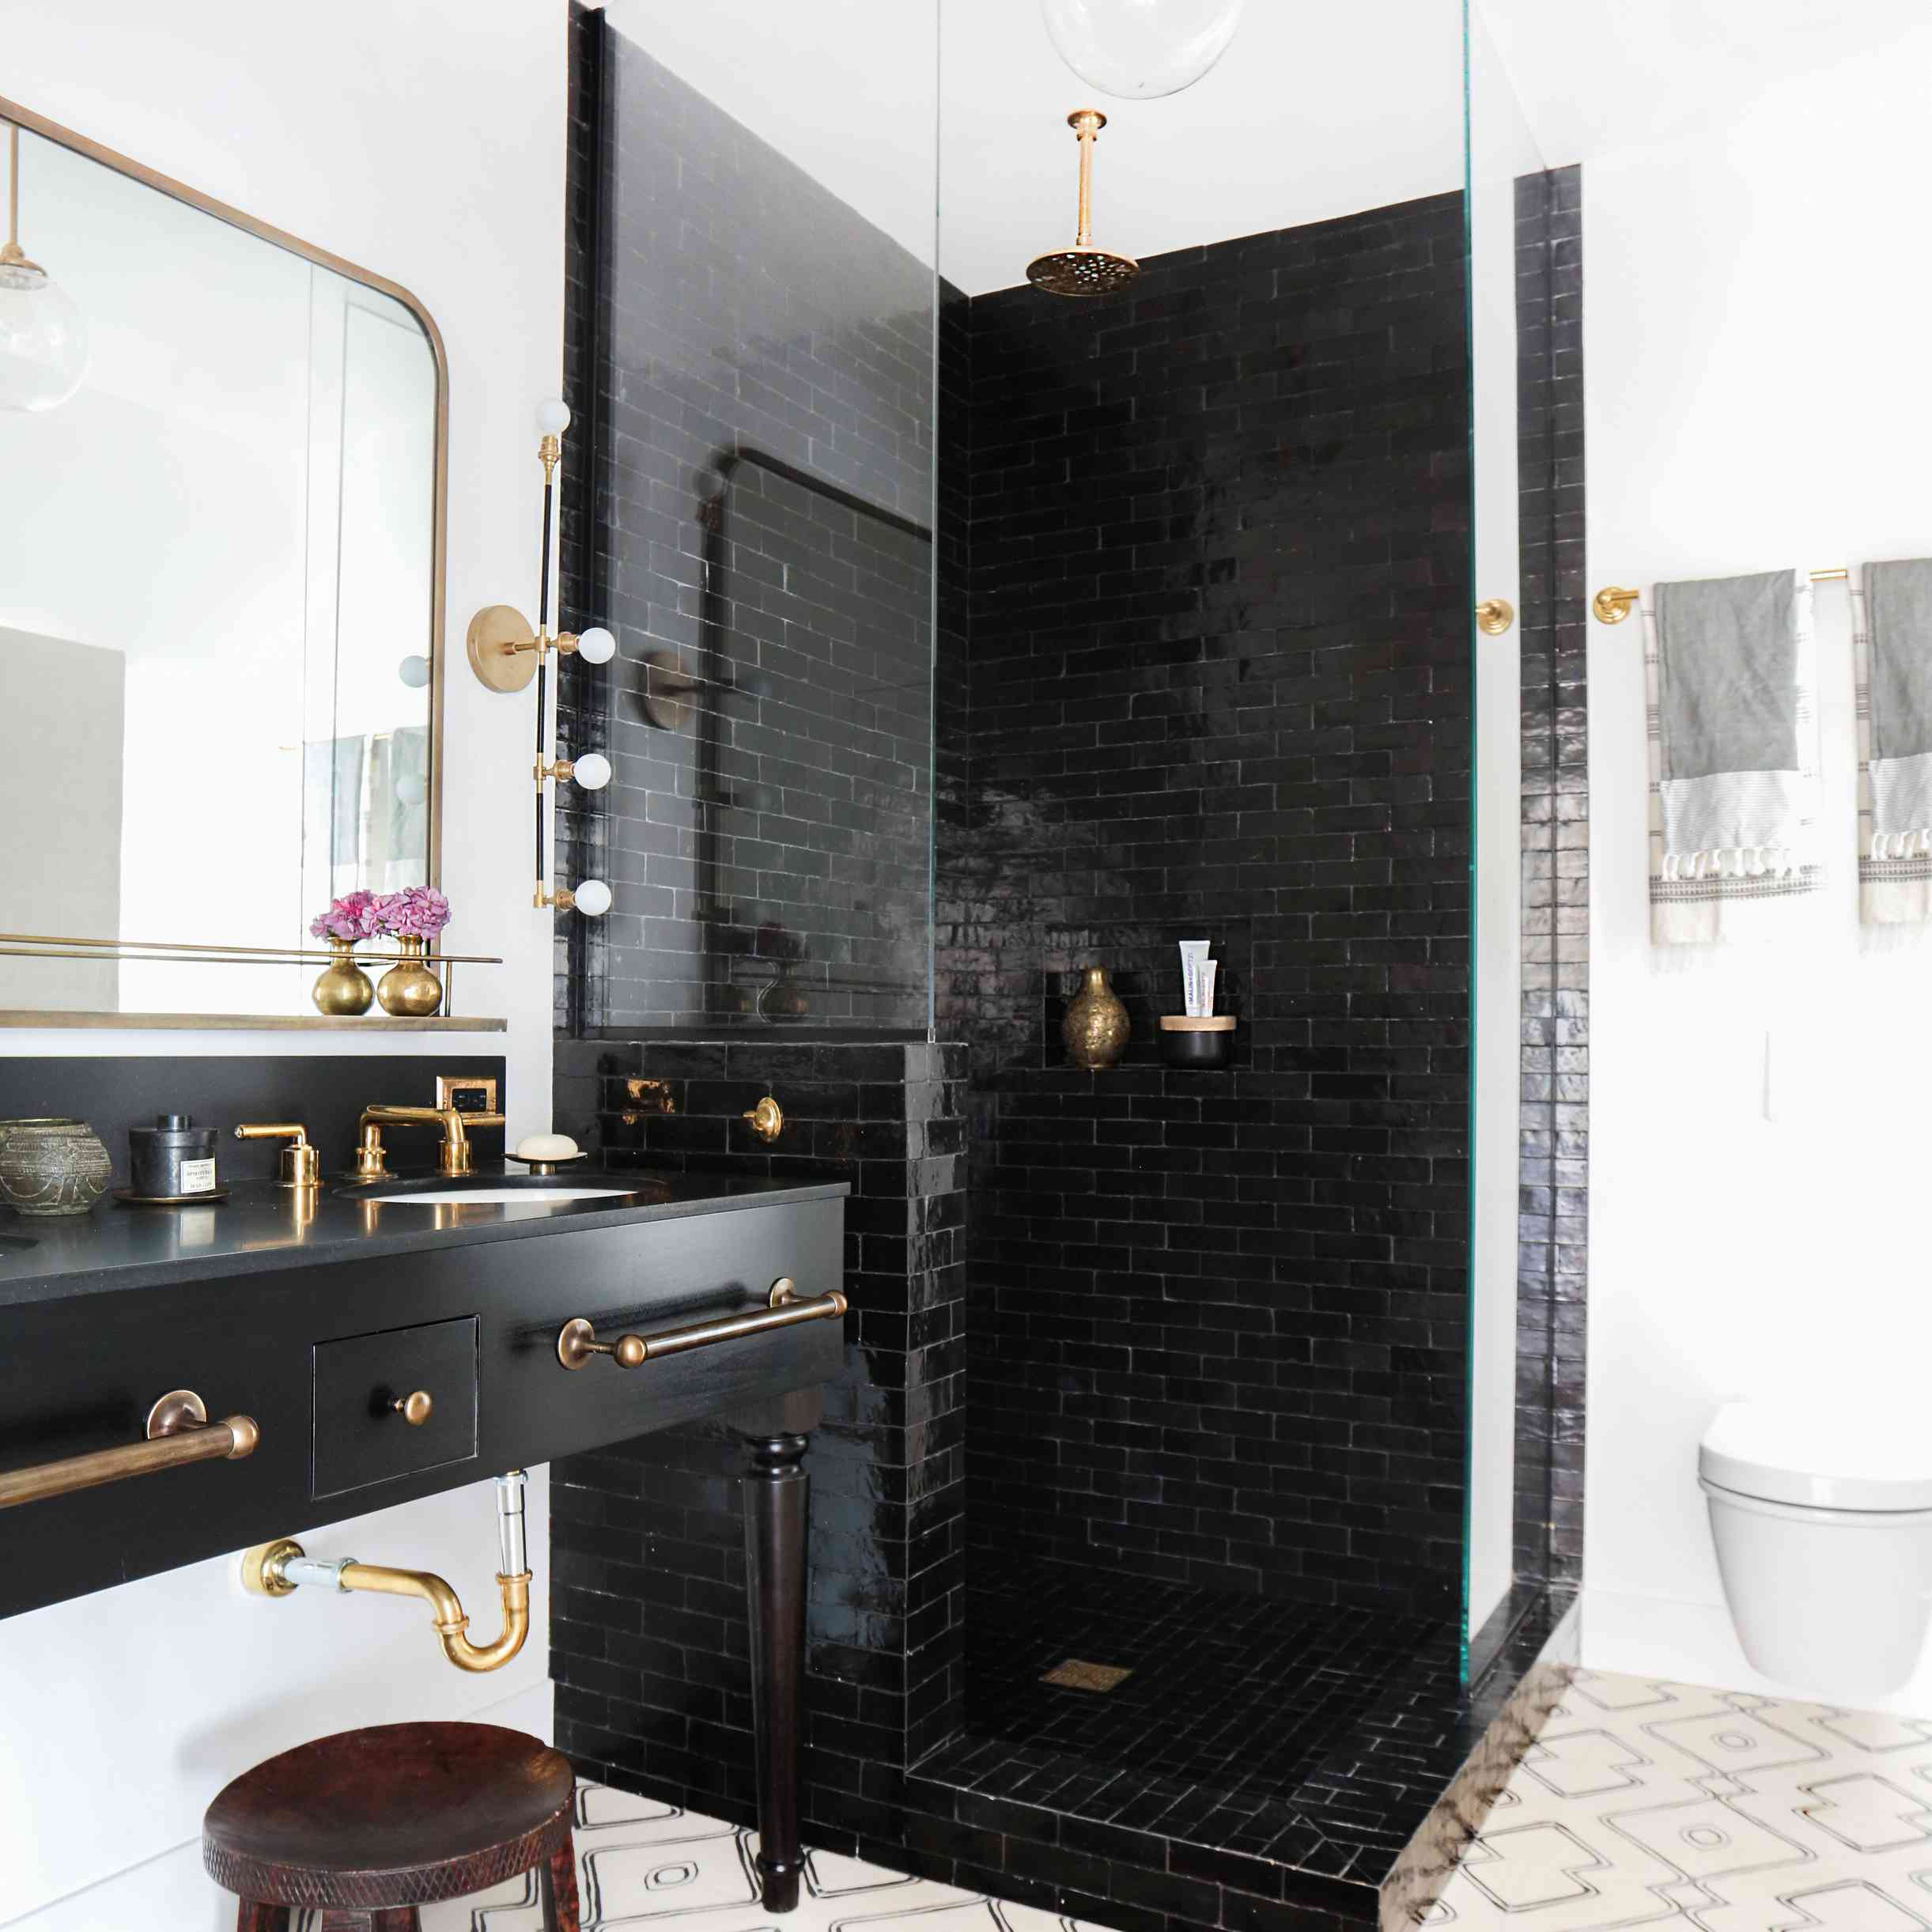 Black subway tile in bathroom